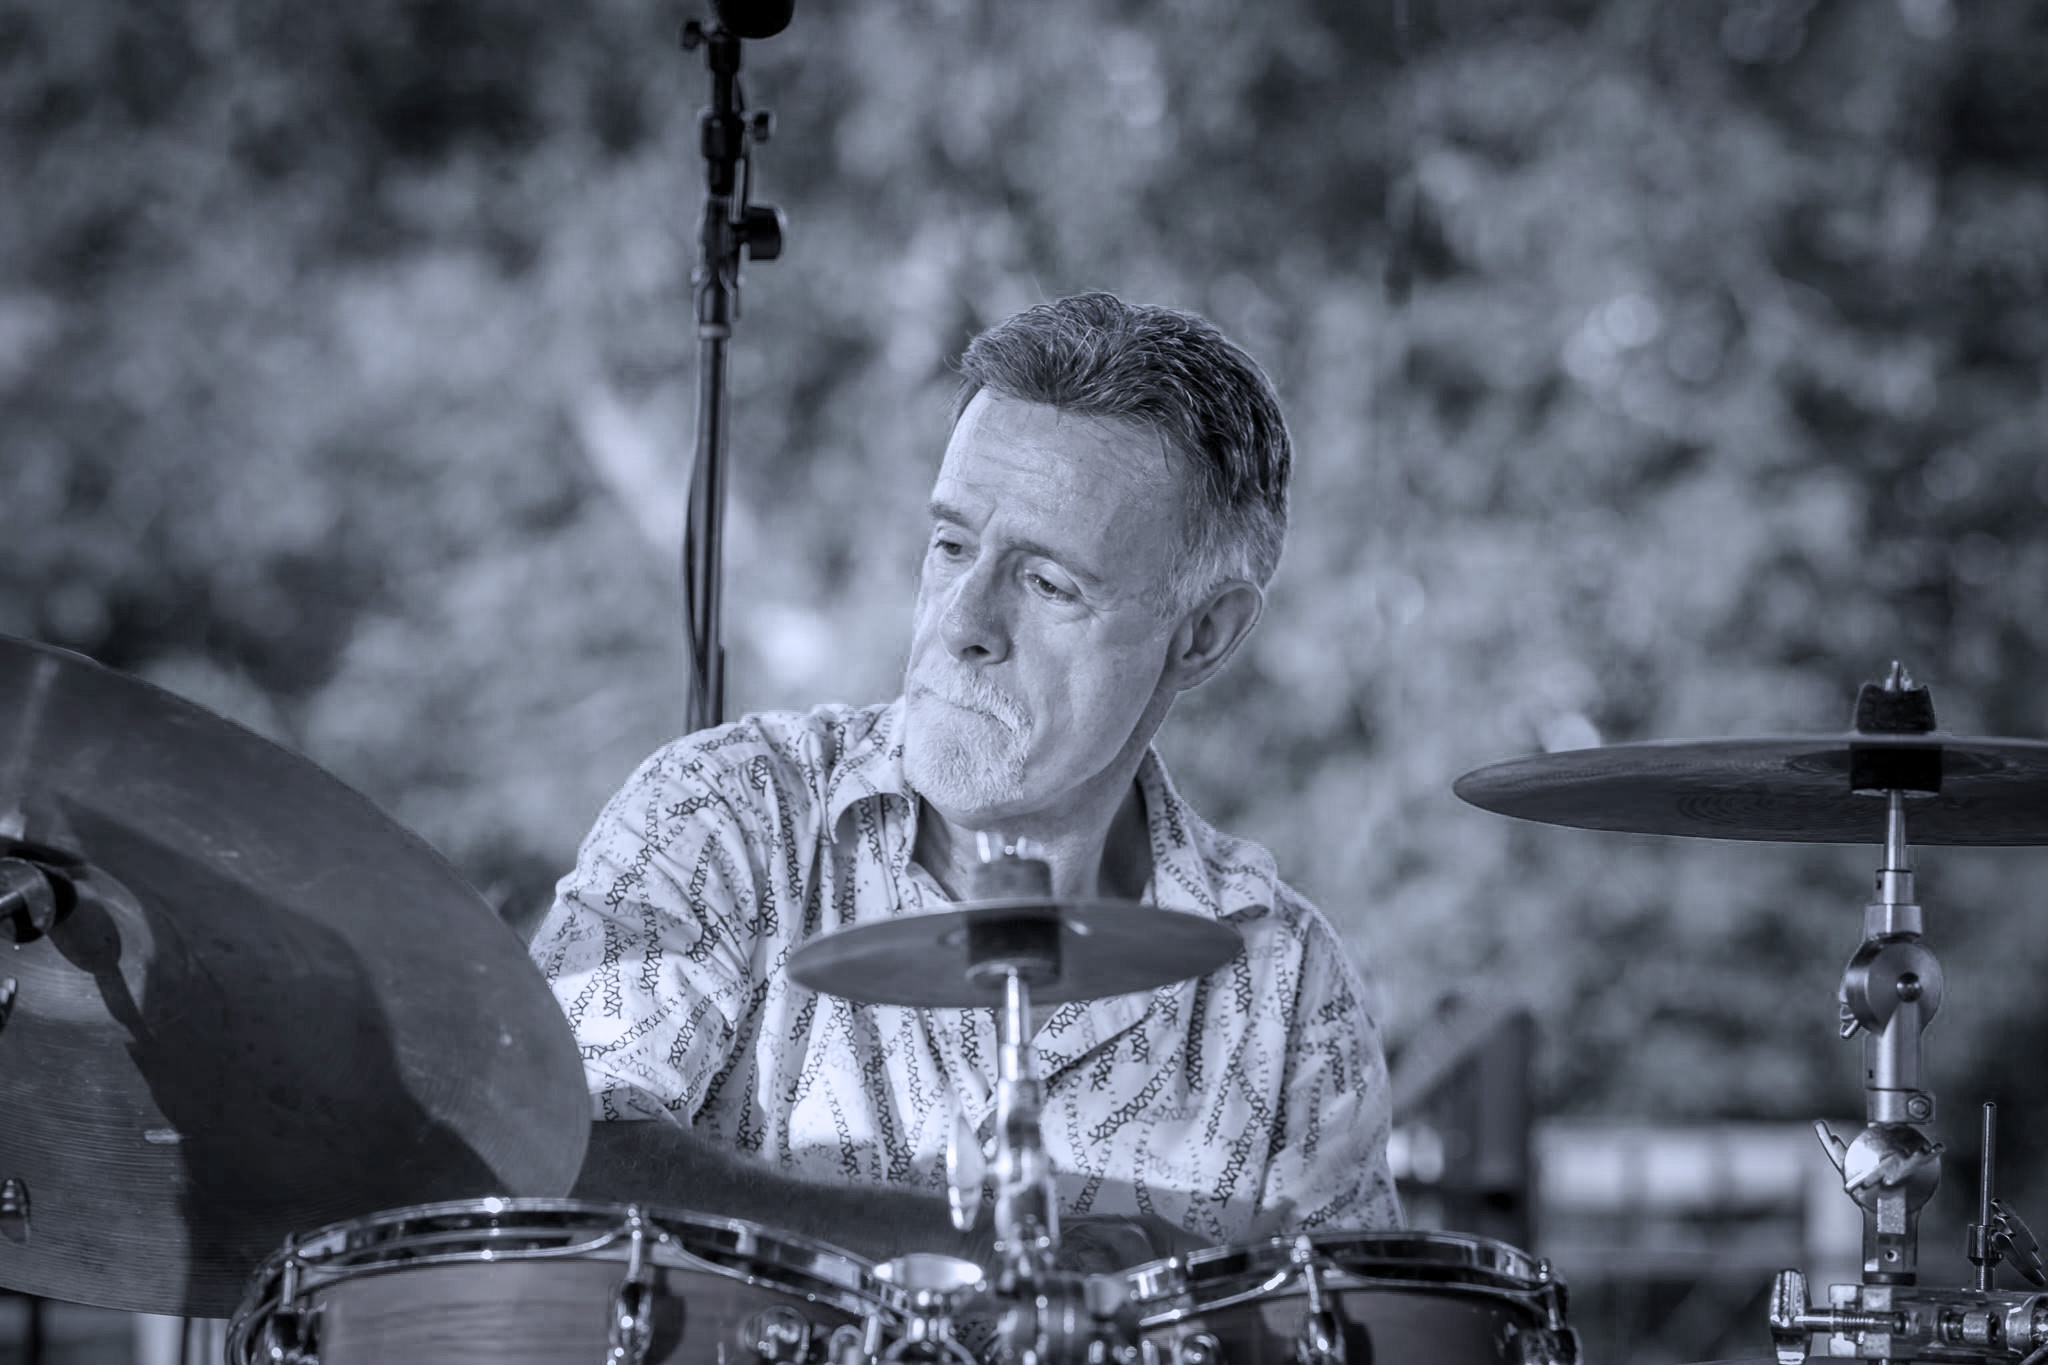 Dave Hanlon Drums Funky Jazz Band Syracuse New York